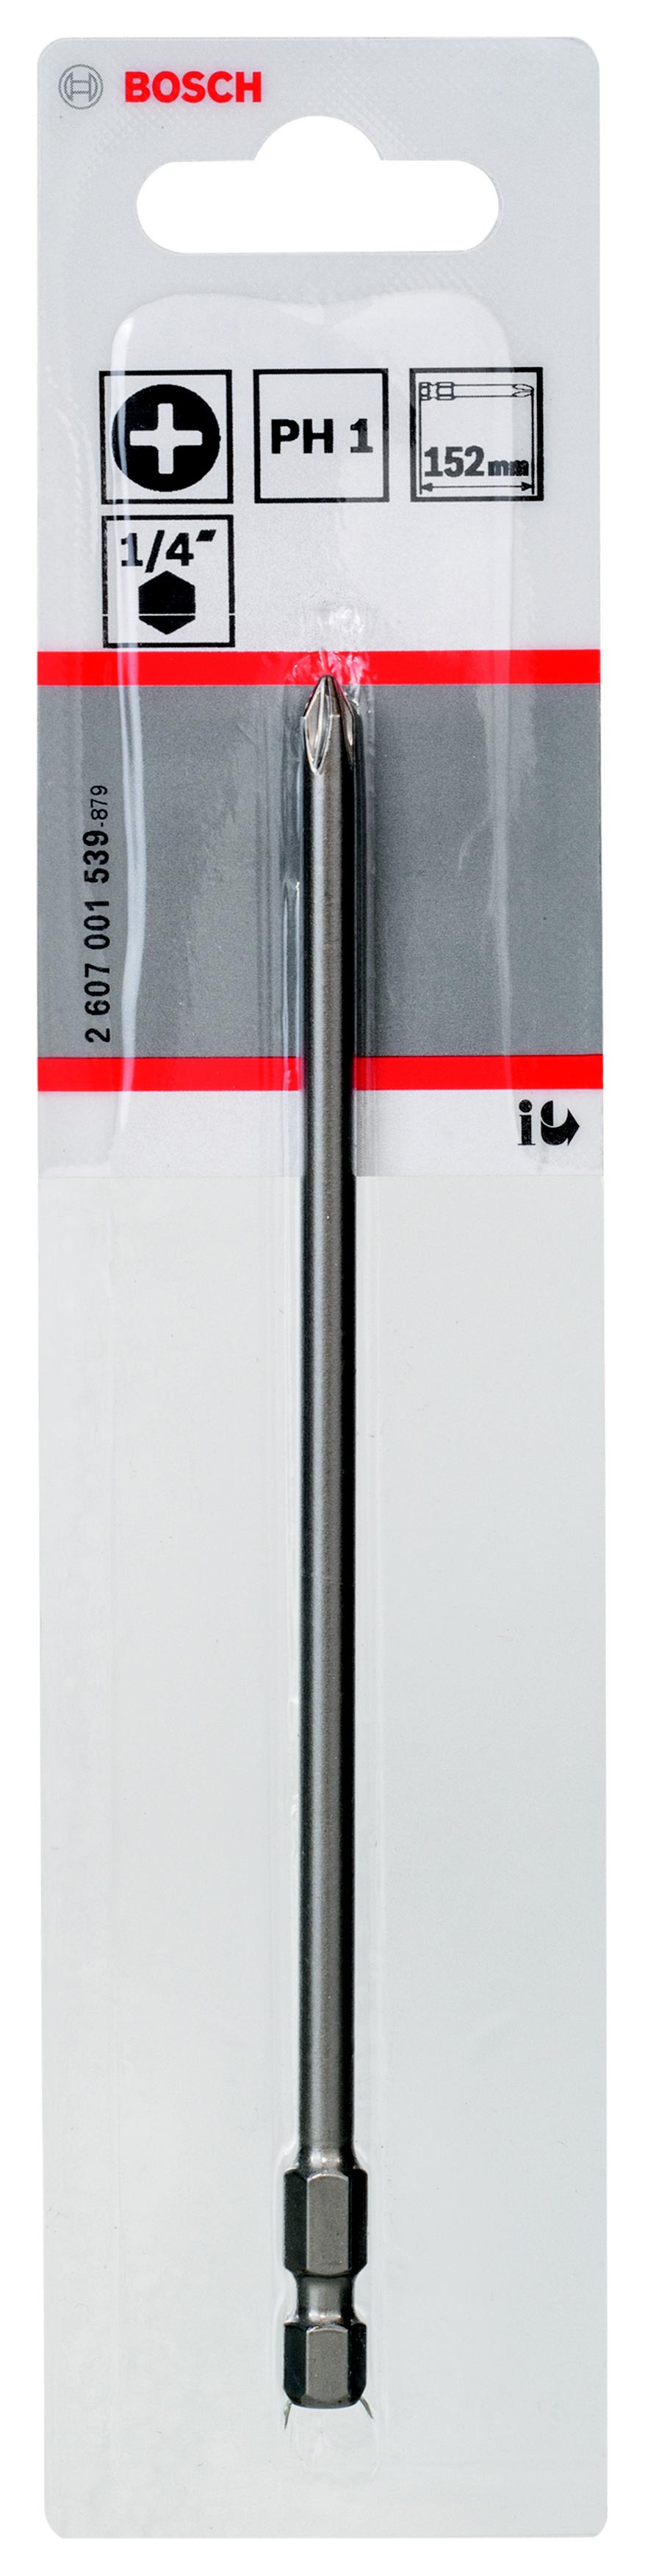 Бита Bosch Extra-hart ph1 152 мм, 1 шт. (2.607.001.539) набор бит bosch ph pz tx sl 12шт extra hart 2 608 255 994